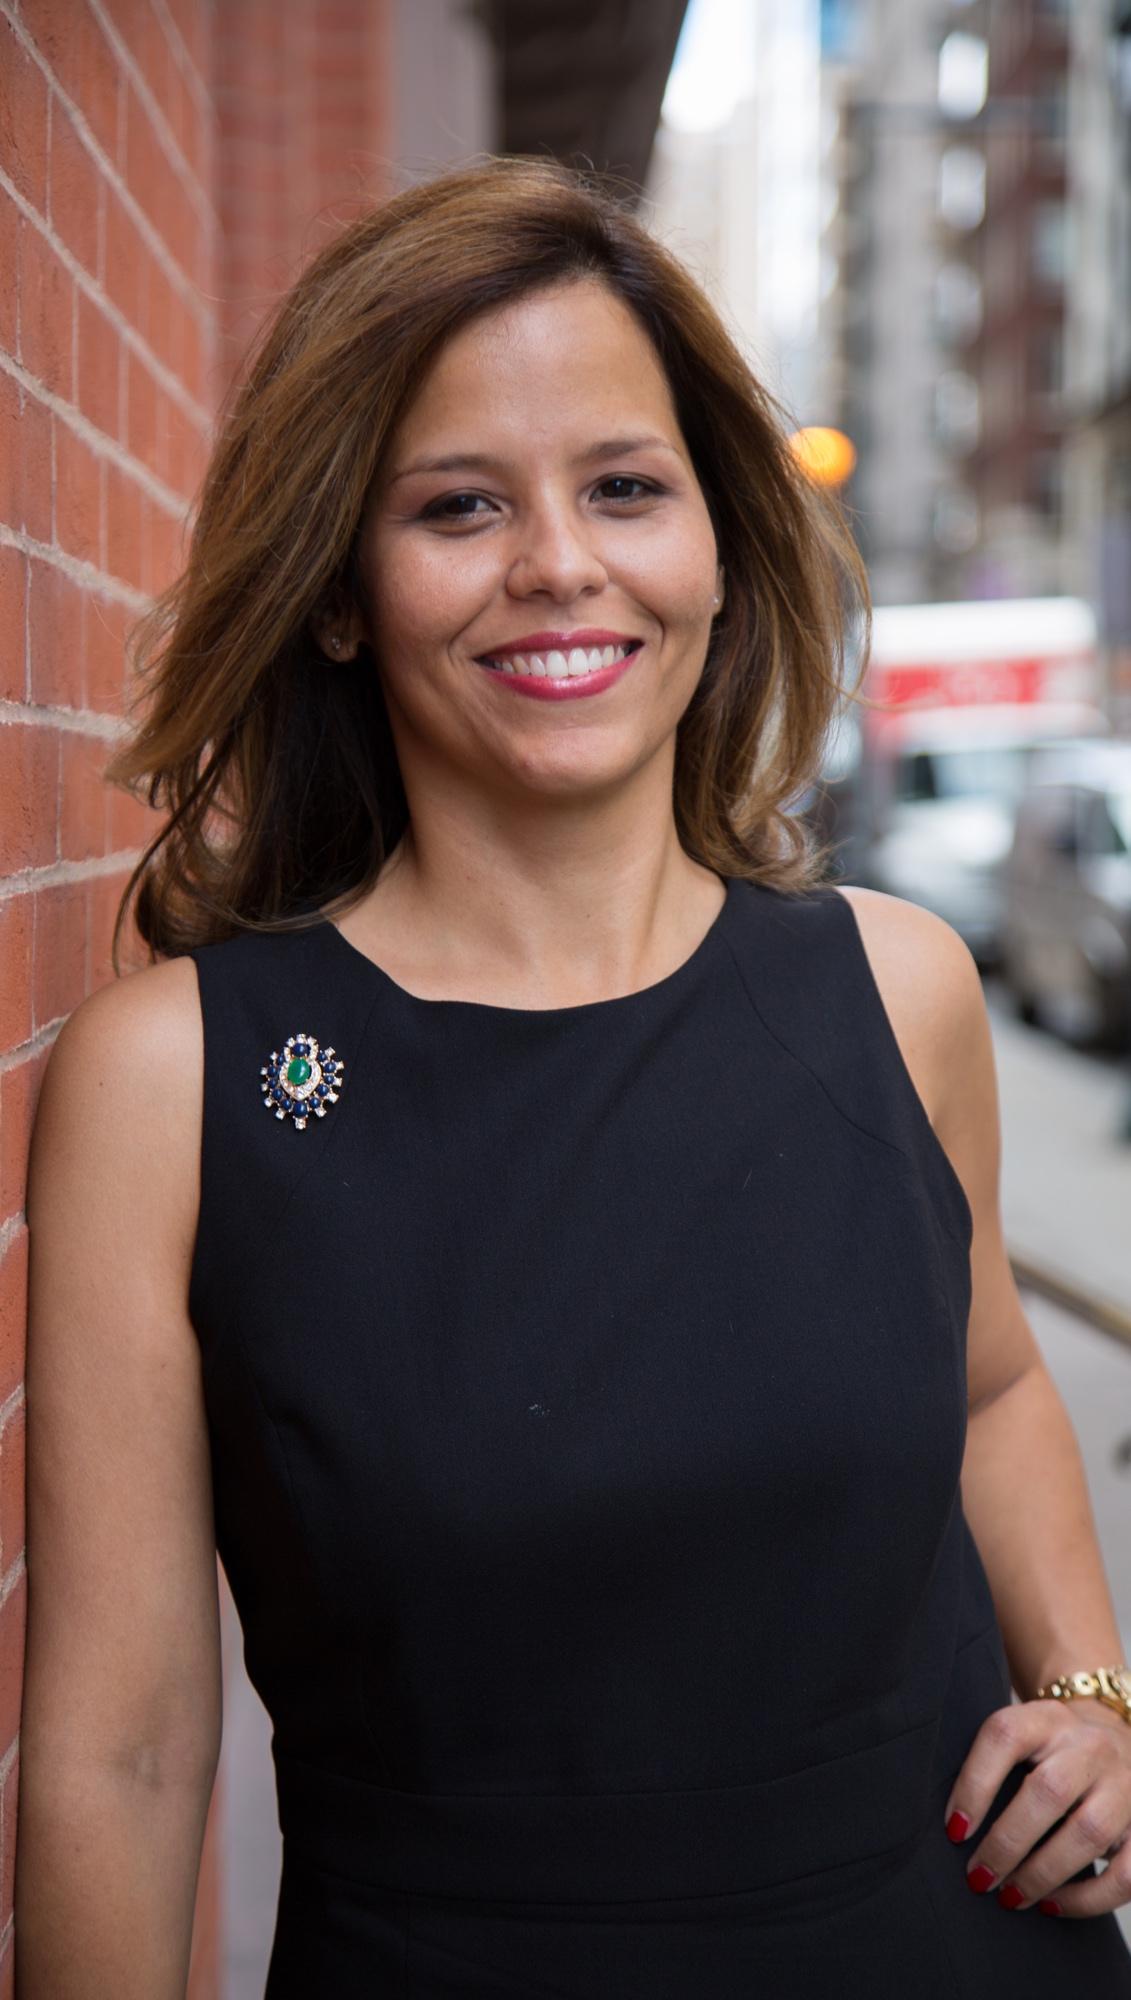 Jennifer Rodríguez, CEO the Greater Philadelphia Hispanic Chamber of Commerce. Photo: Samantha Laub / AL DÍA News